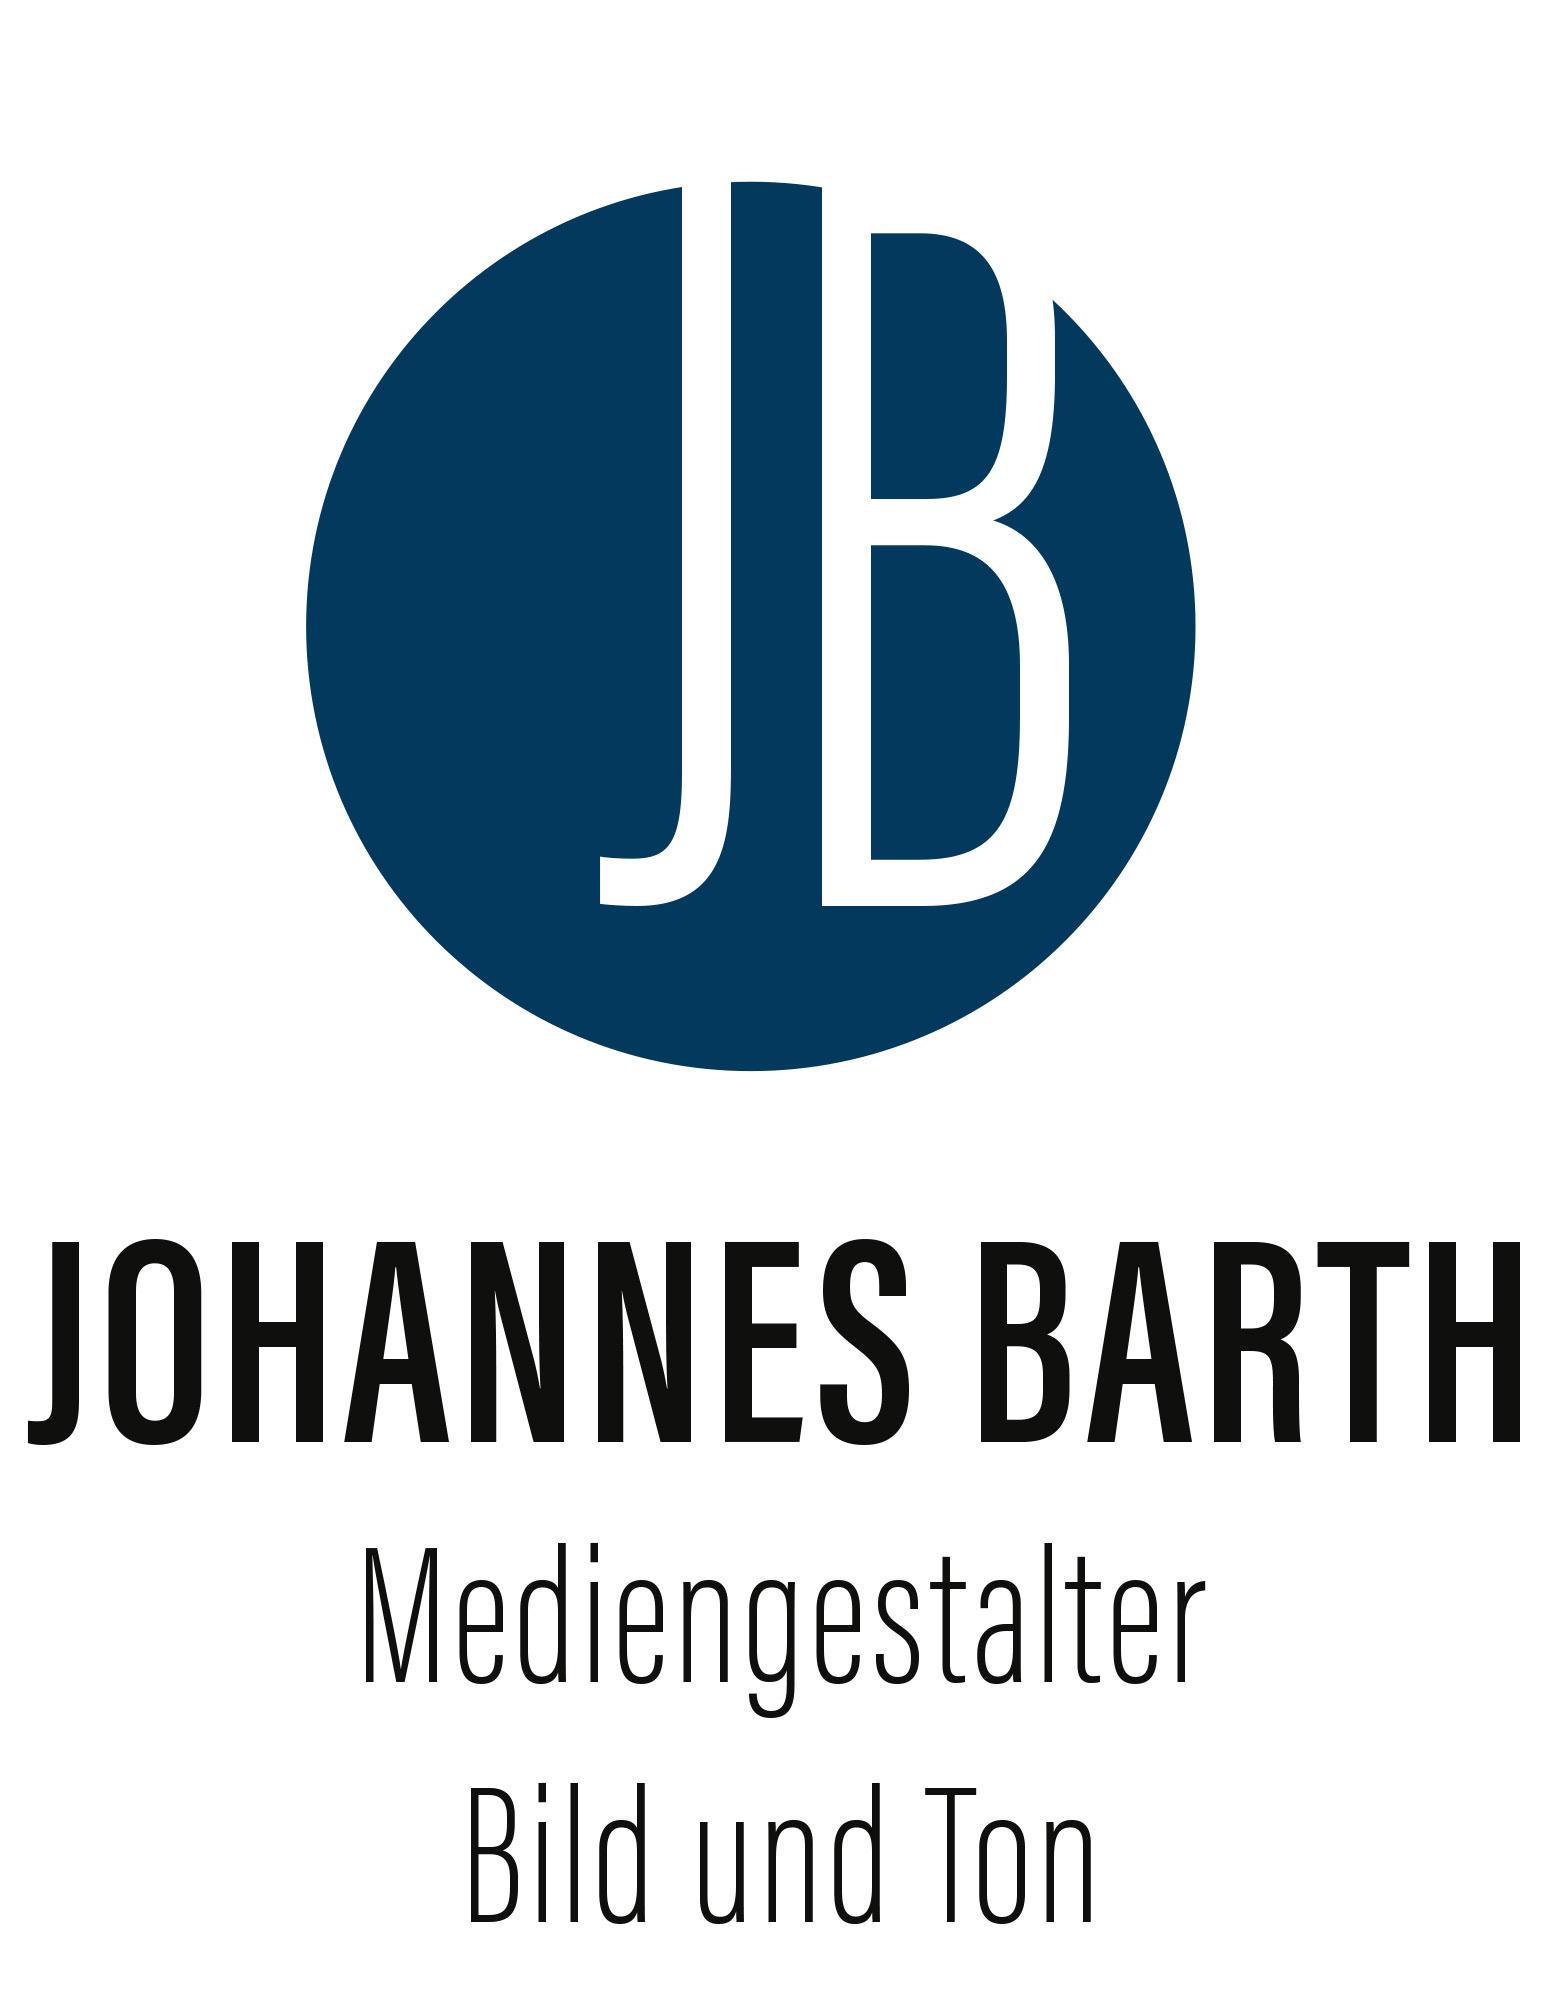 Johannes Barth